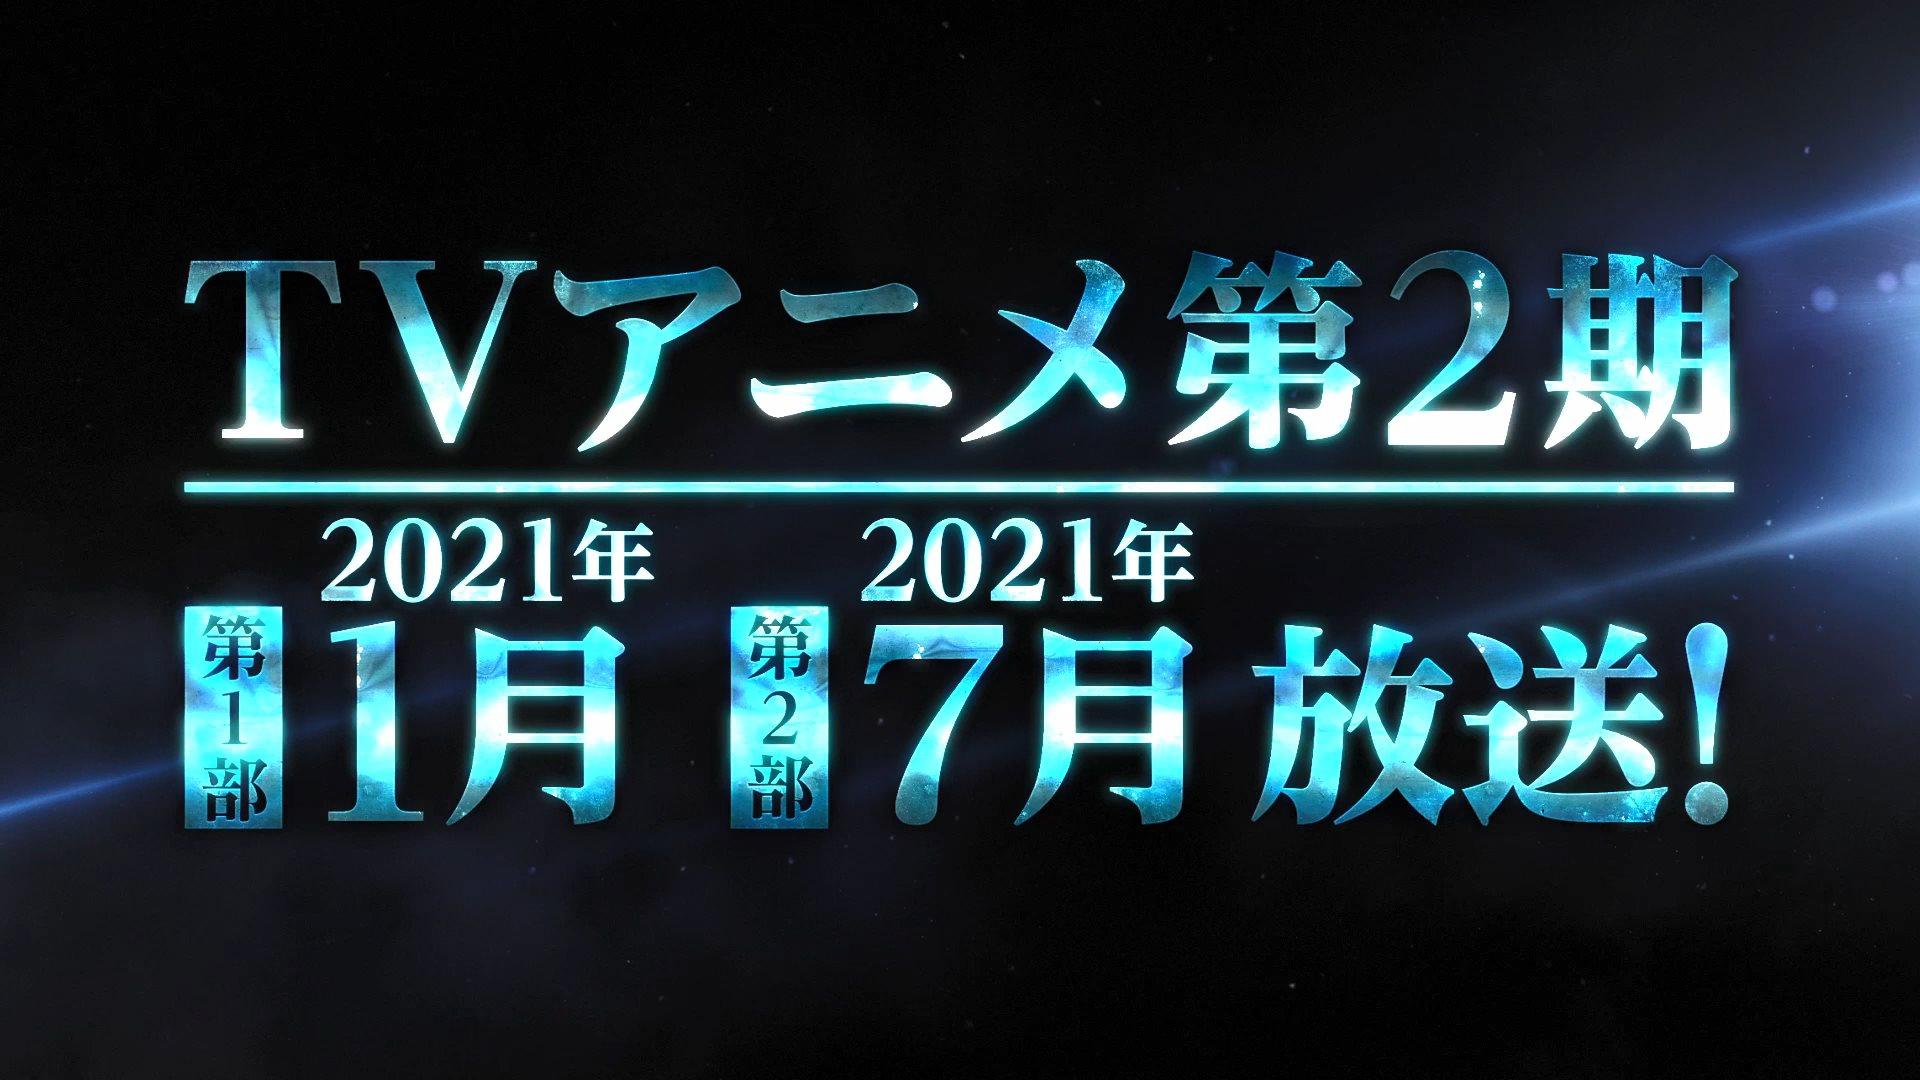 TV动画《转生酿成史莱姆》第二季延期至明年1月